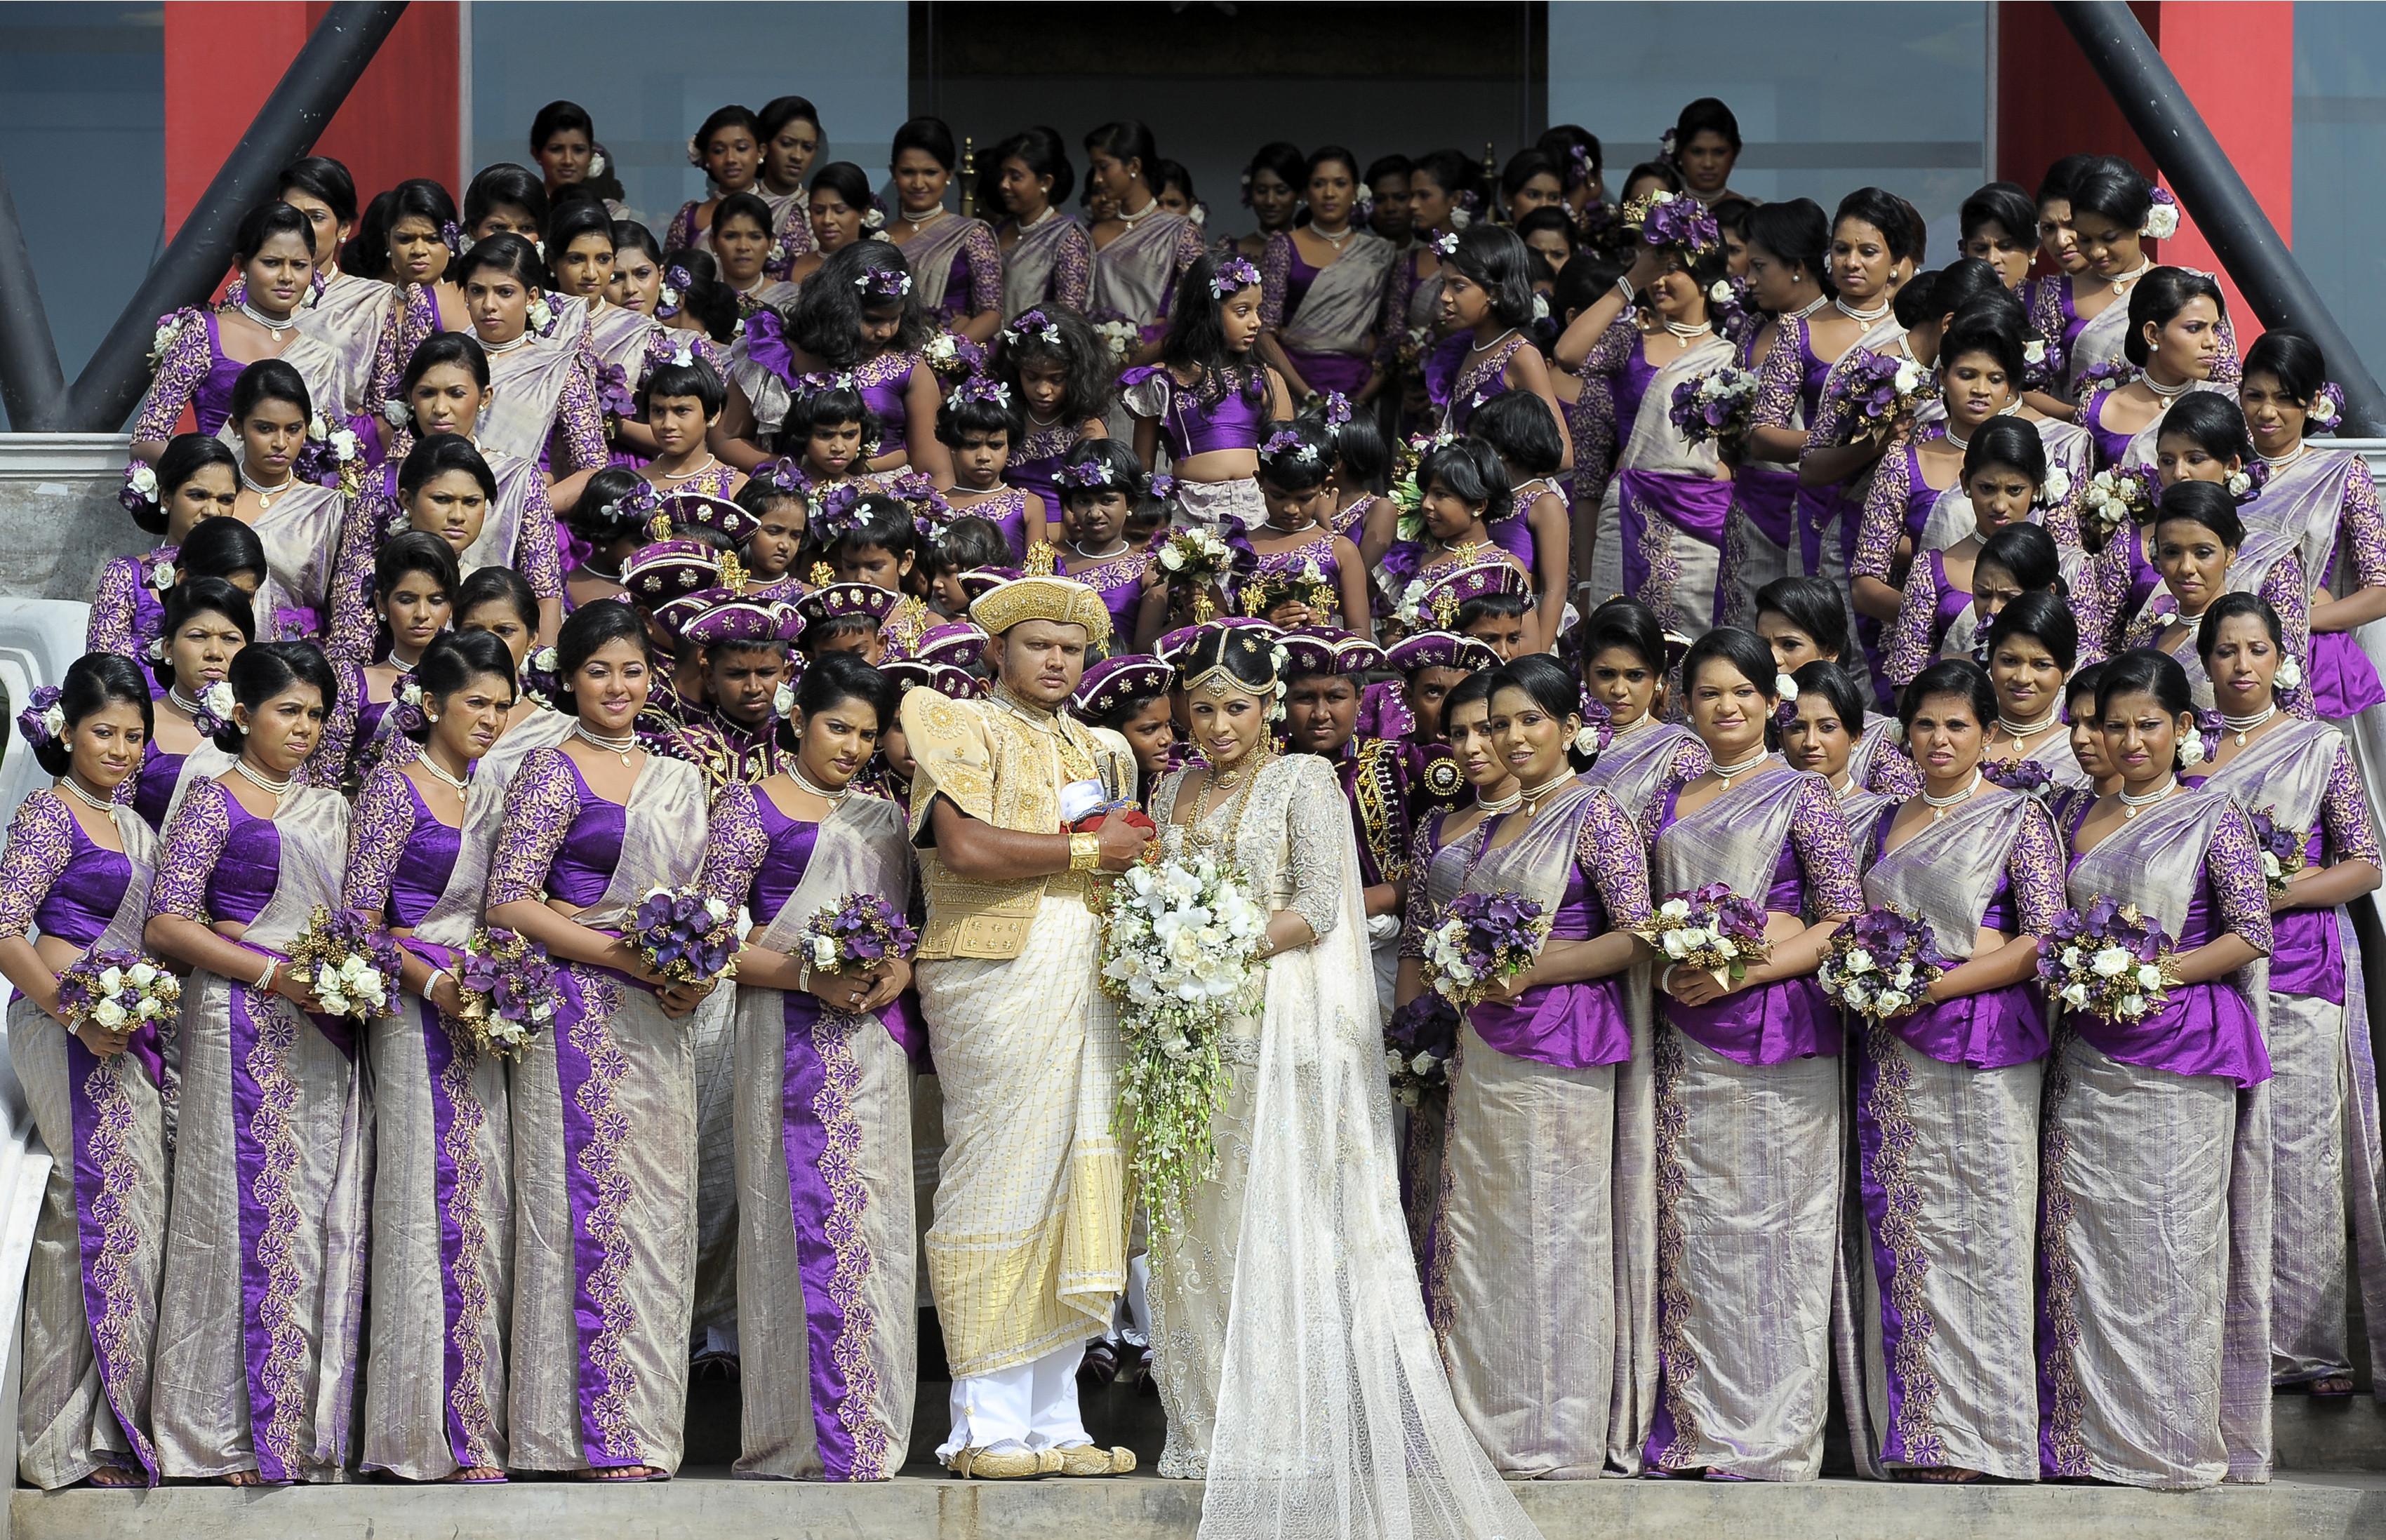 Ini Edo Wedding Ceremony